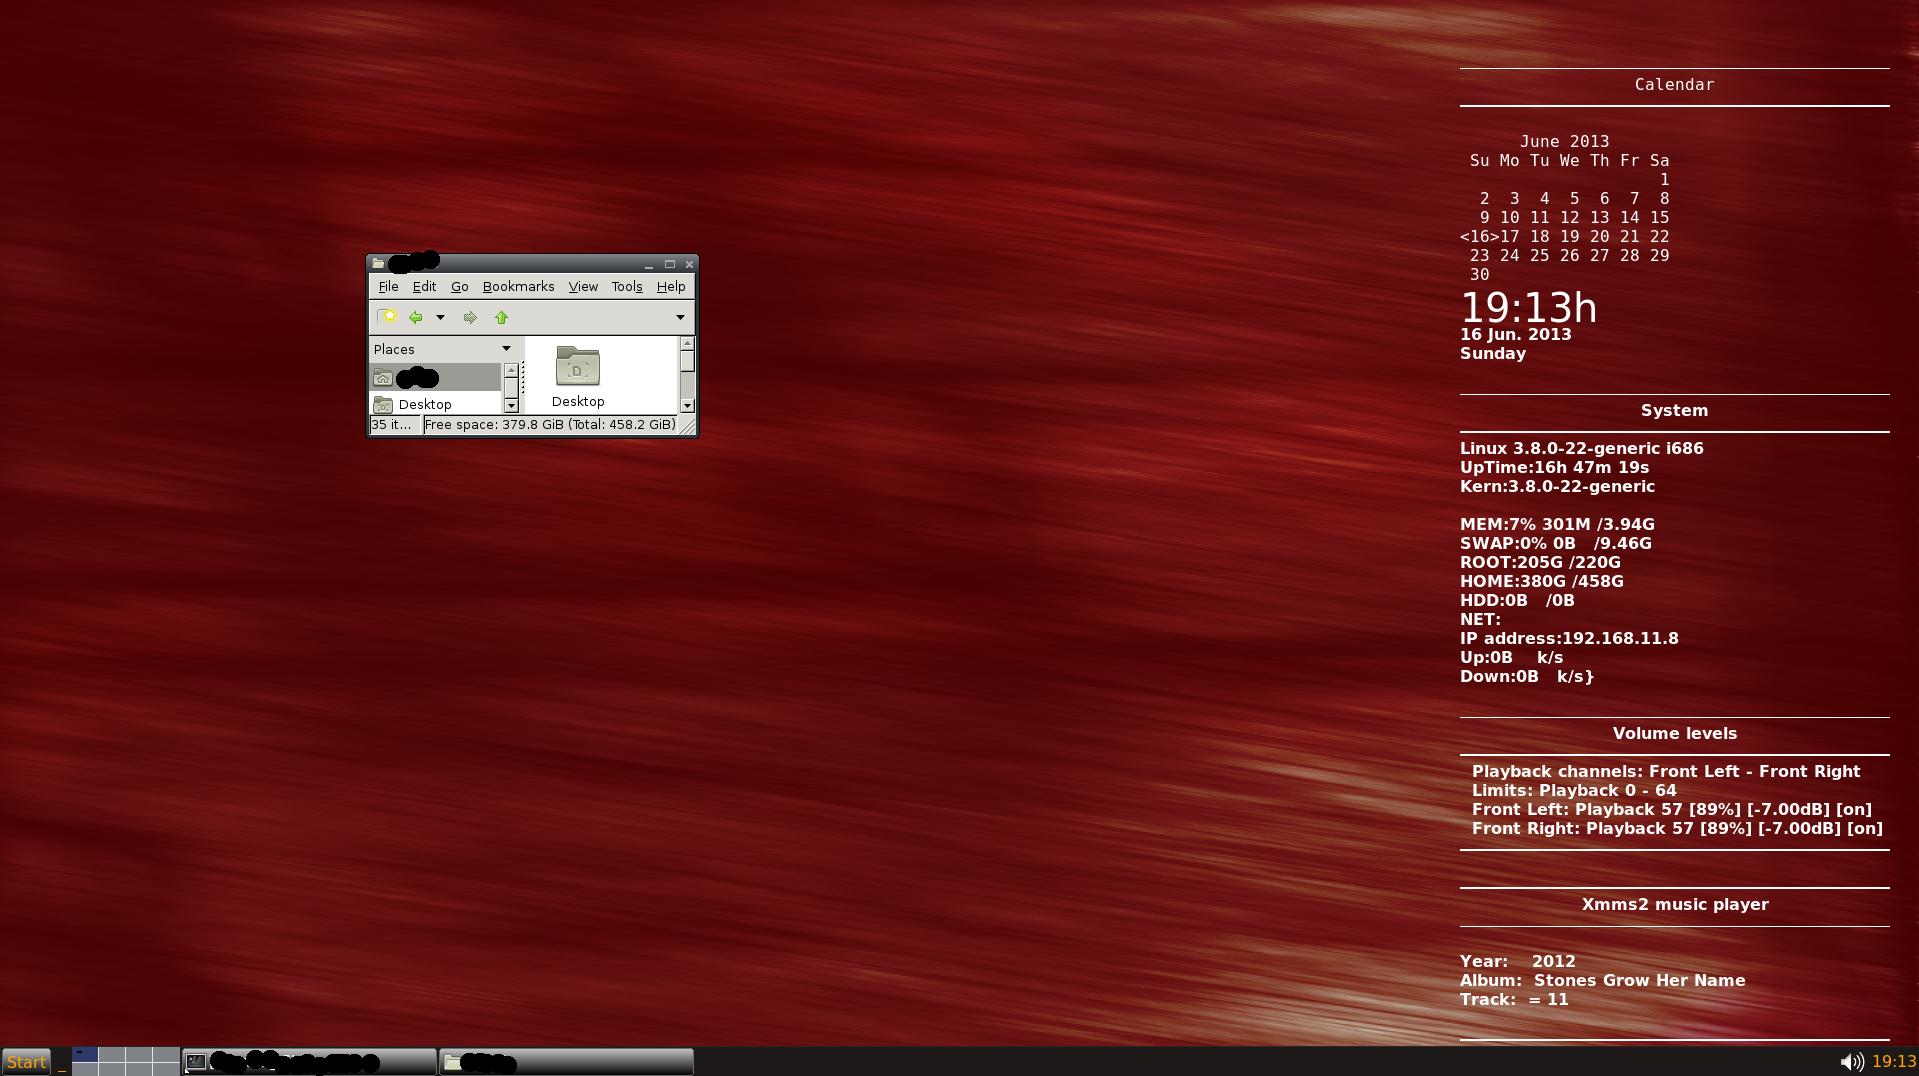 jwm screenshot, jwm screen, jwm linux